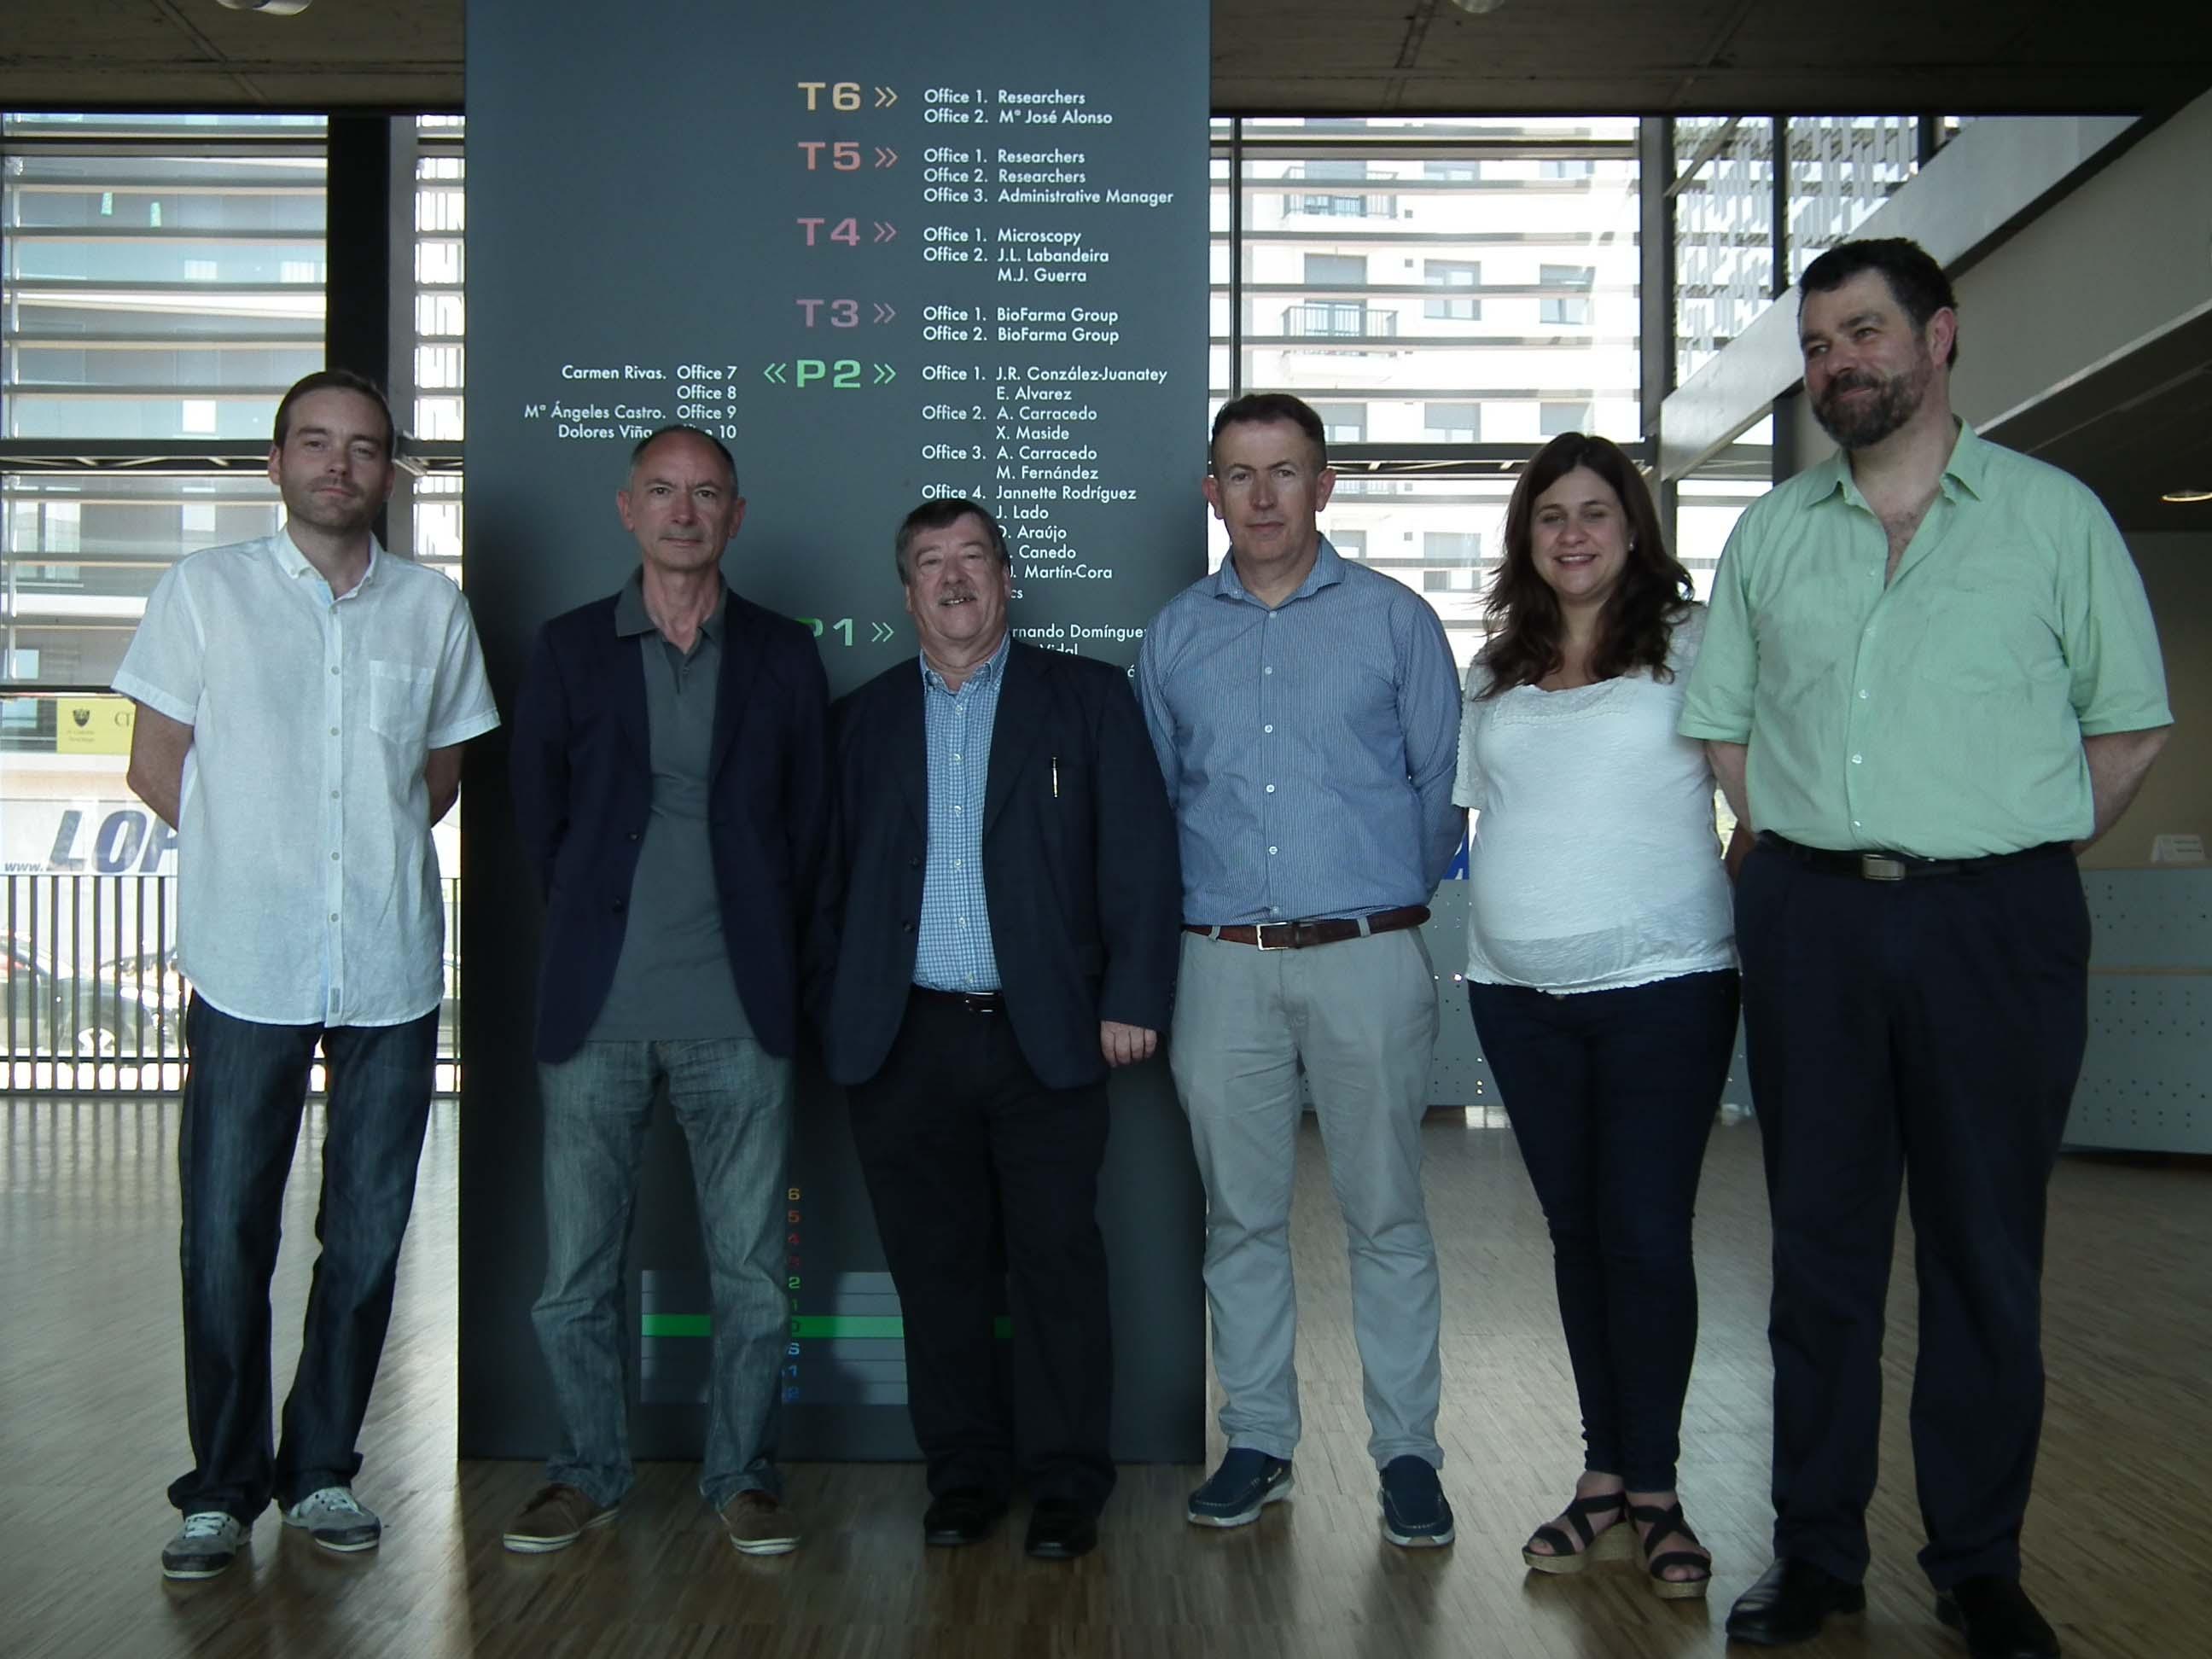 Samuel Seoane, Román Pérez, Antonio Mouriño, Esteban Castelao, Efigenia Arias e Miguel Maestro